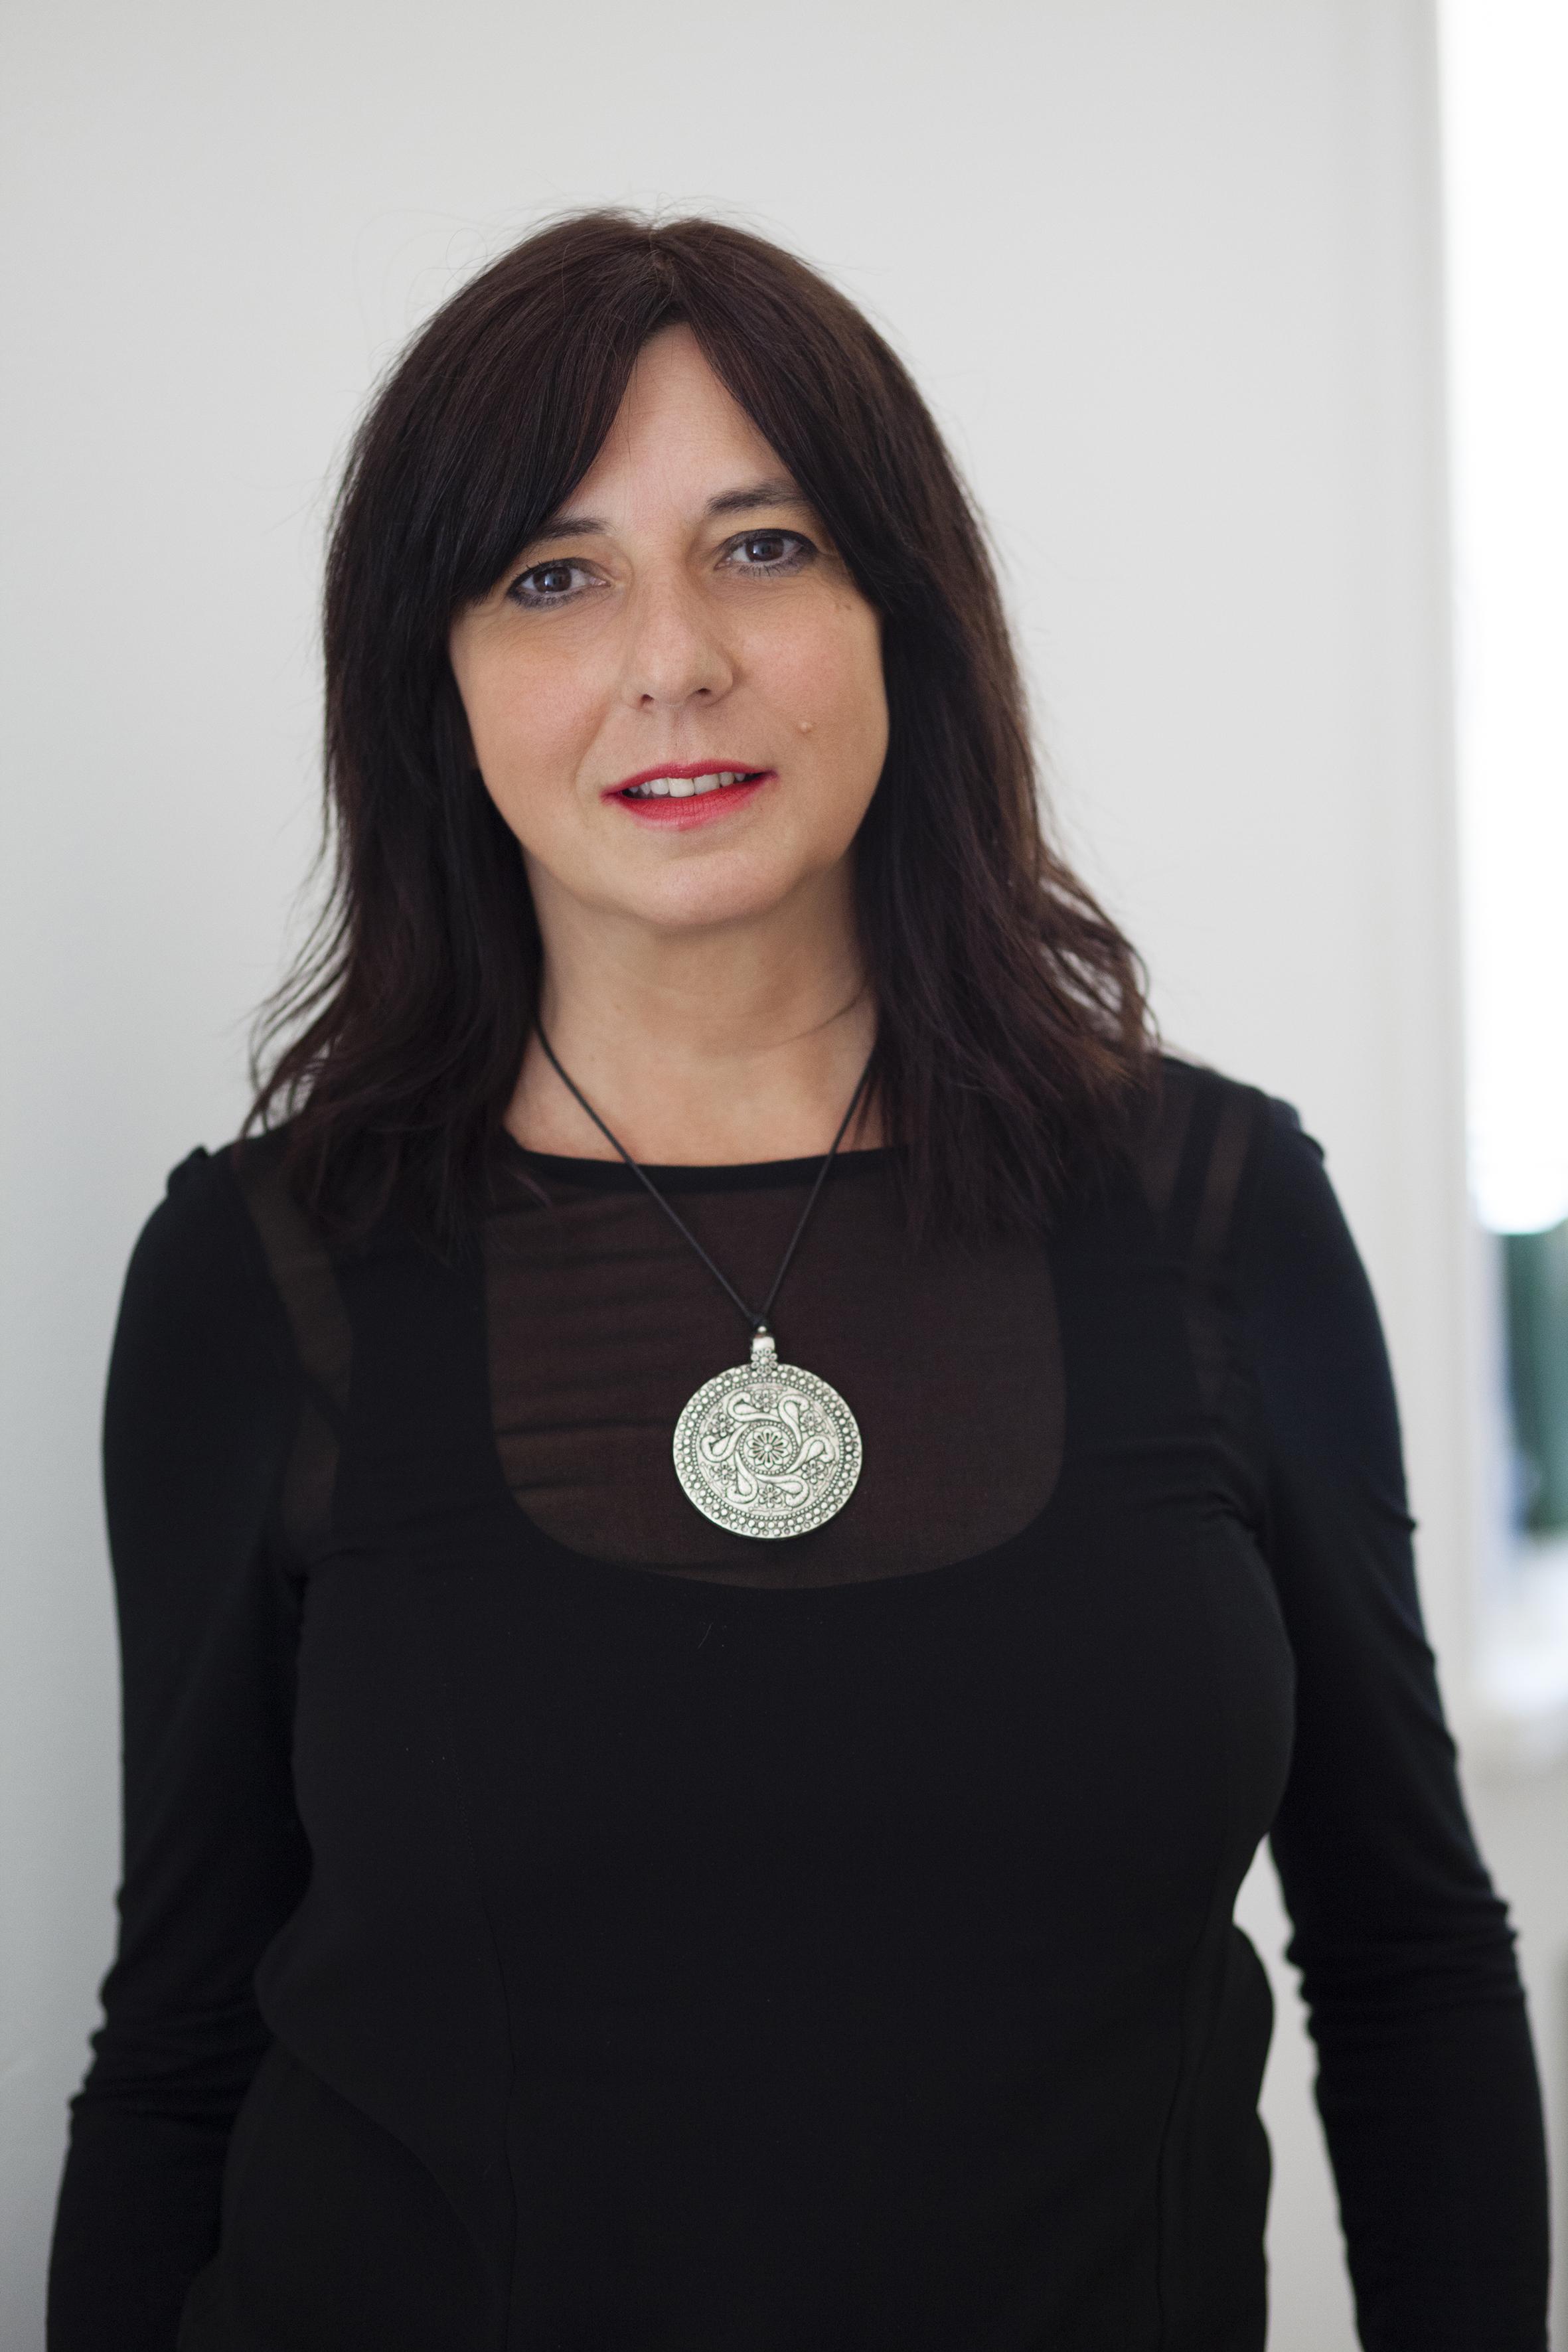 Avv. Annamaria Zara